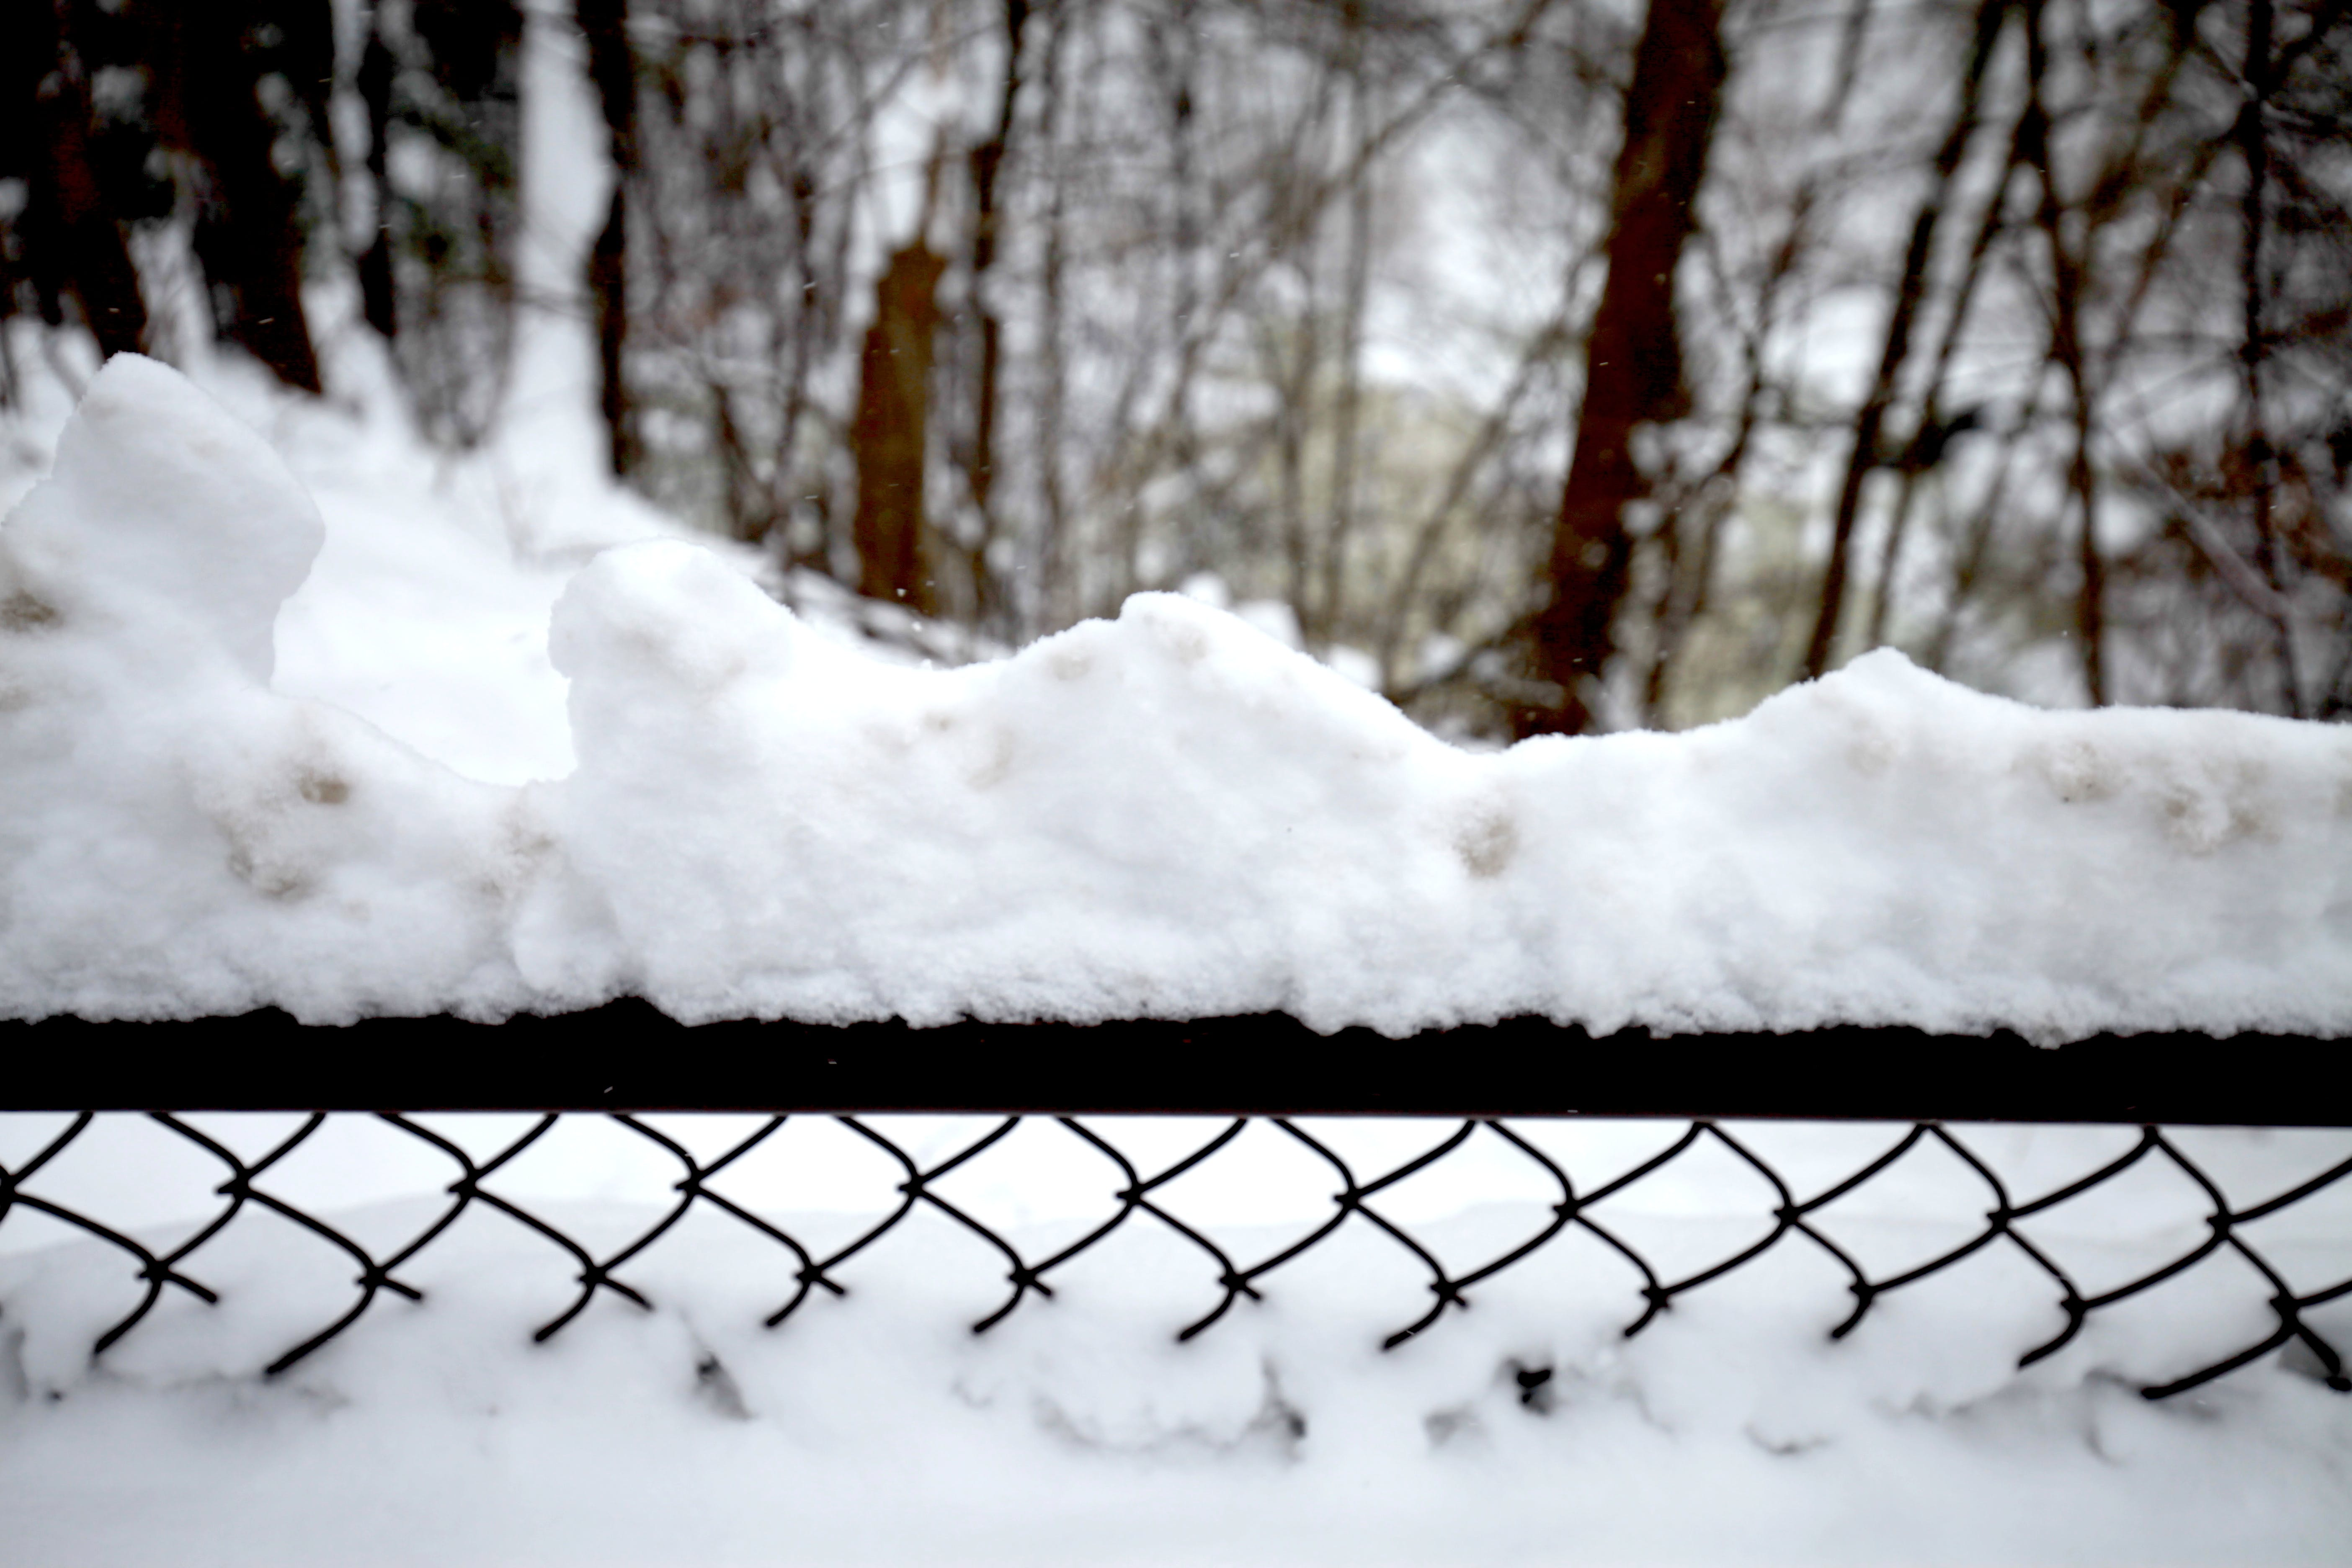 Free stock photo of #SnowAdornedFence